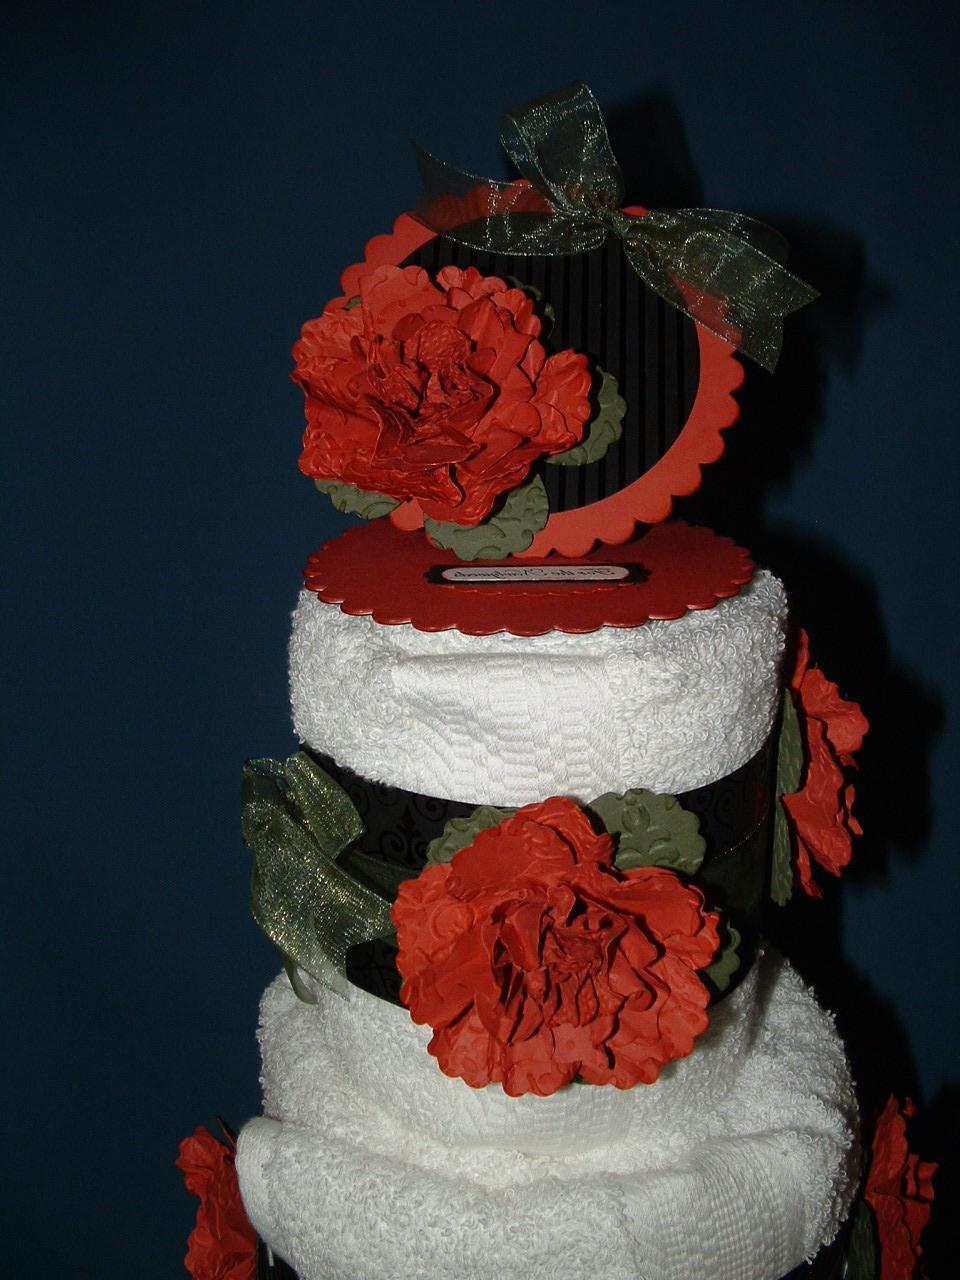 Towel Cake for a Wedding